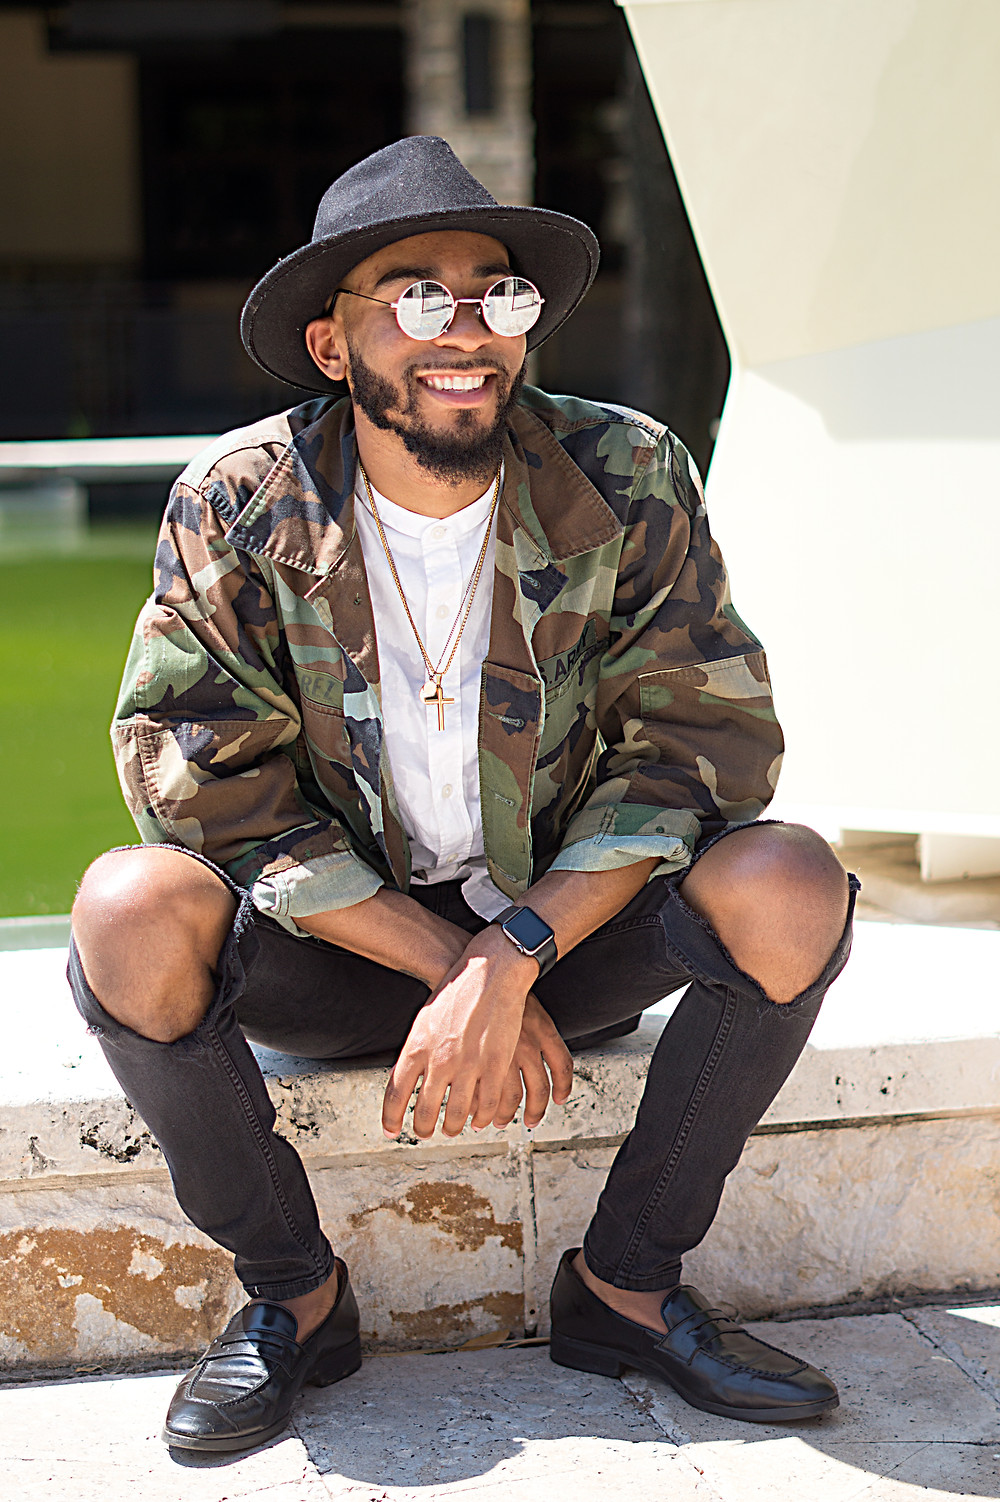 mens fashion, hm shirt, zara jeans, hm shoes, nordstrom hat, casual wear, houston fashion, houston style